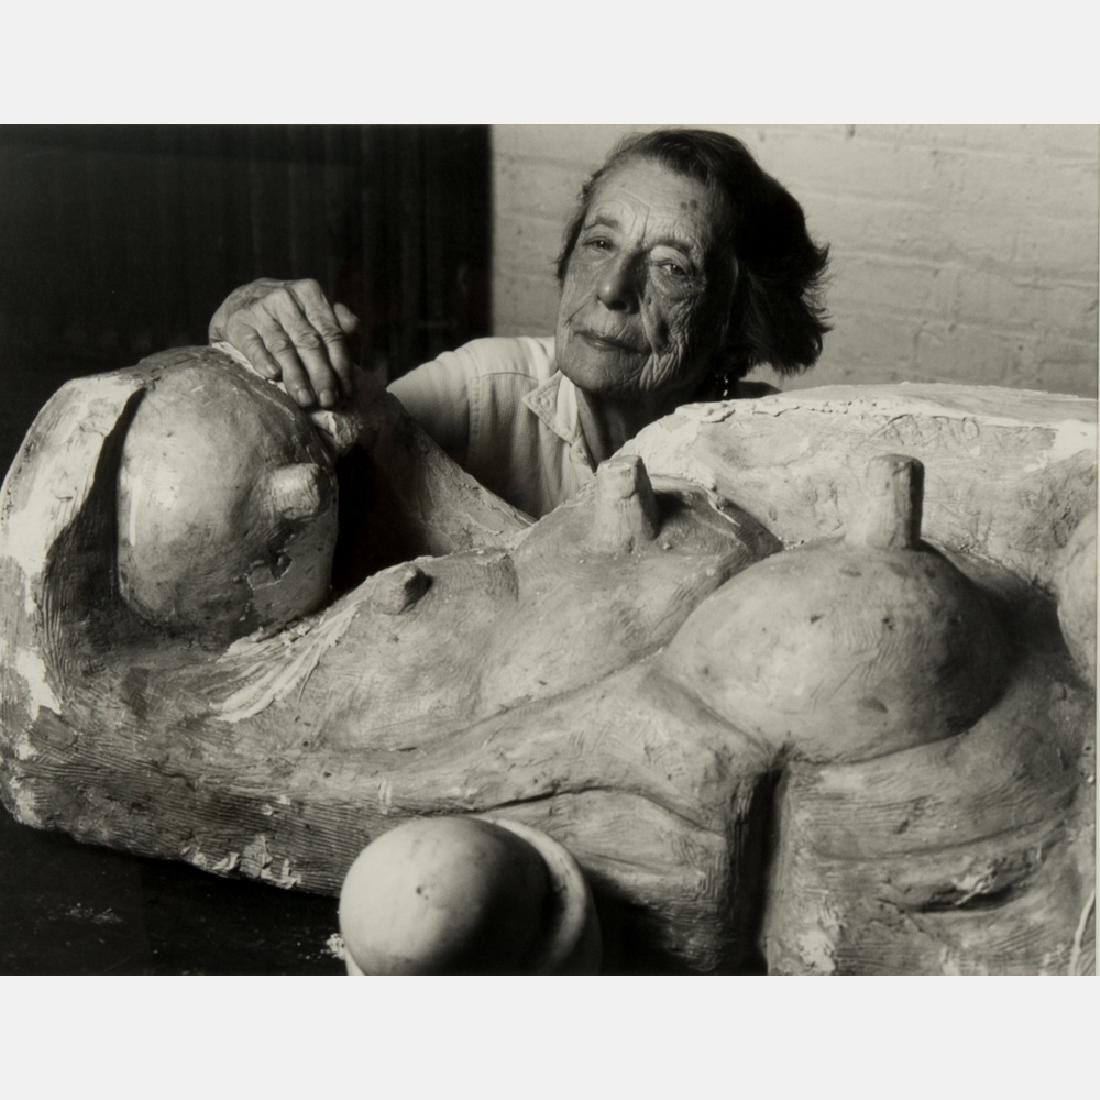 Abe Frajndlich (b. 1946) Louise Bourgeois, Brooklyn,